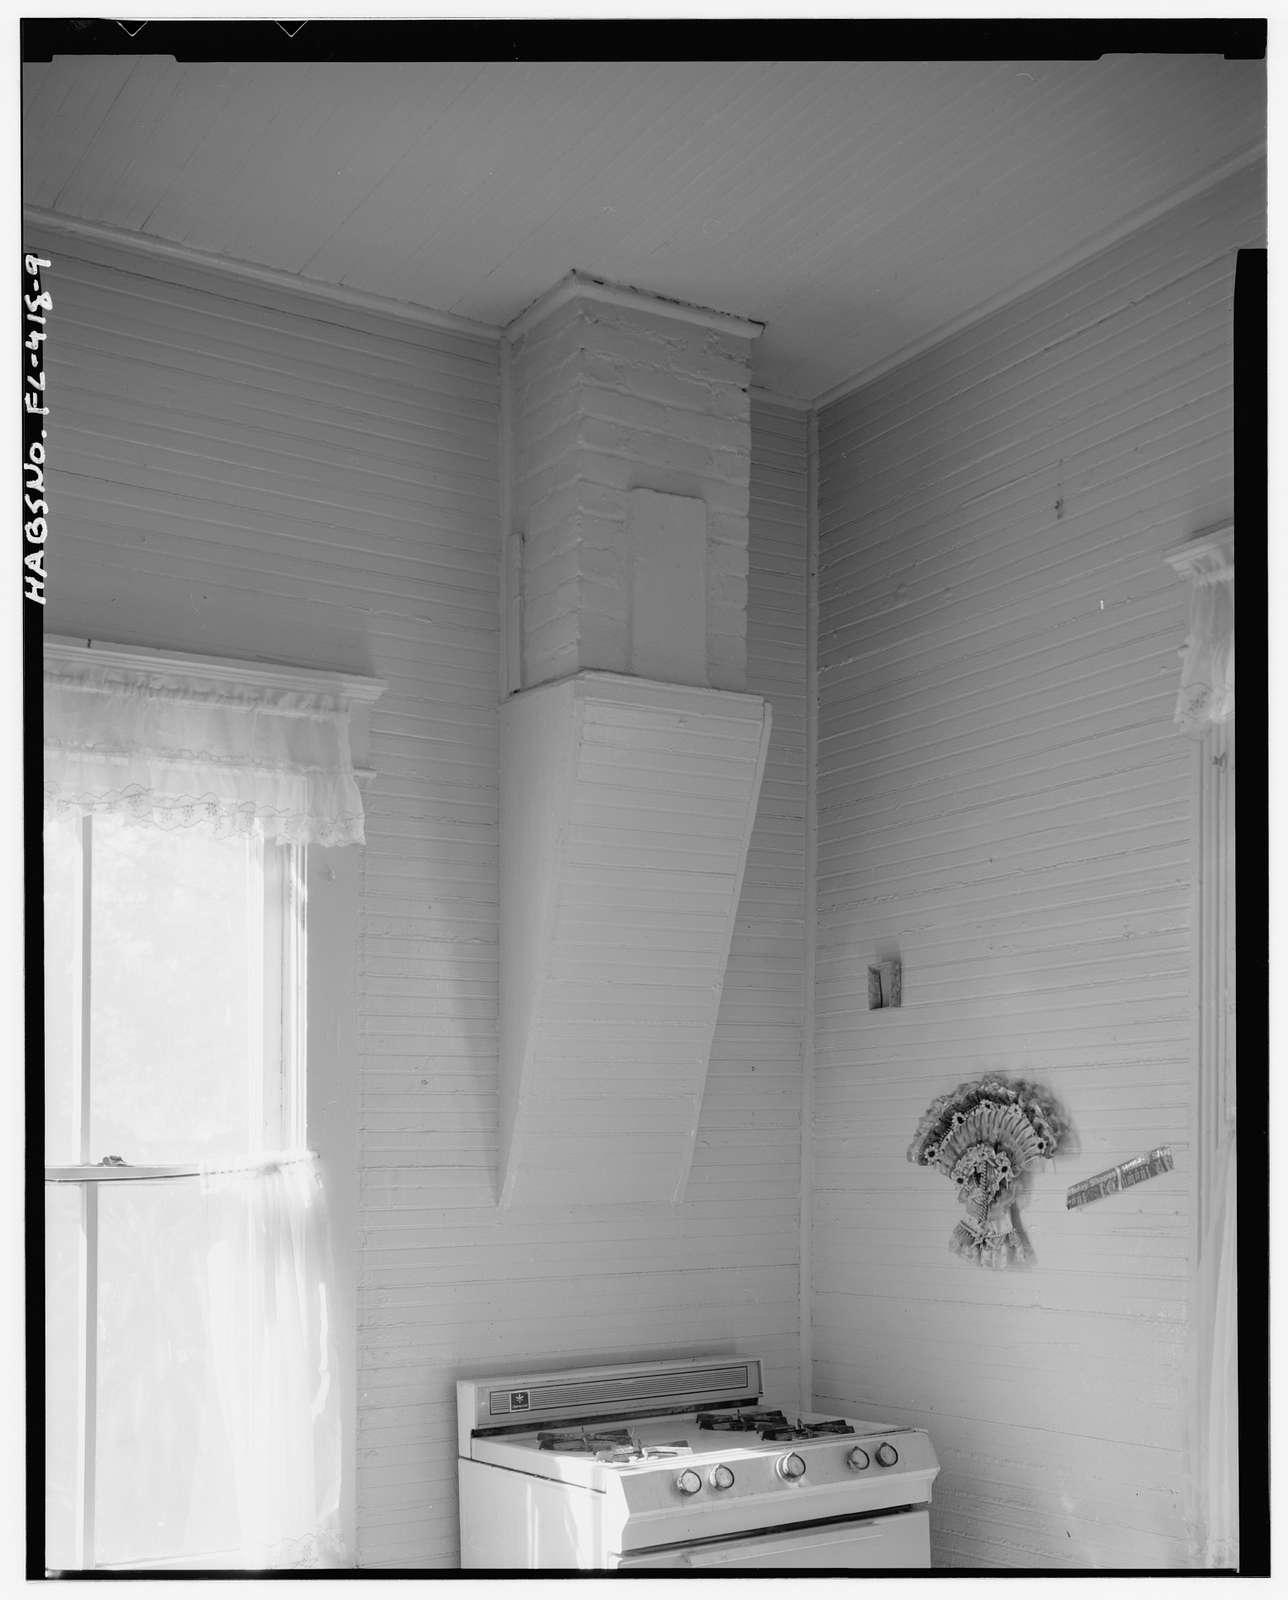 1815 East Fifteenth Avenue (House), Tampa, Hillsborough County, FL